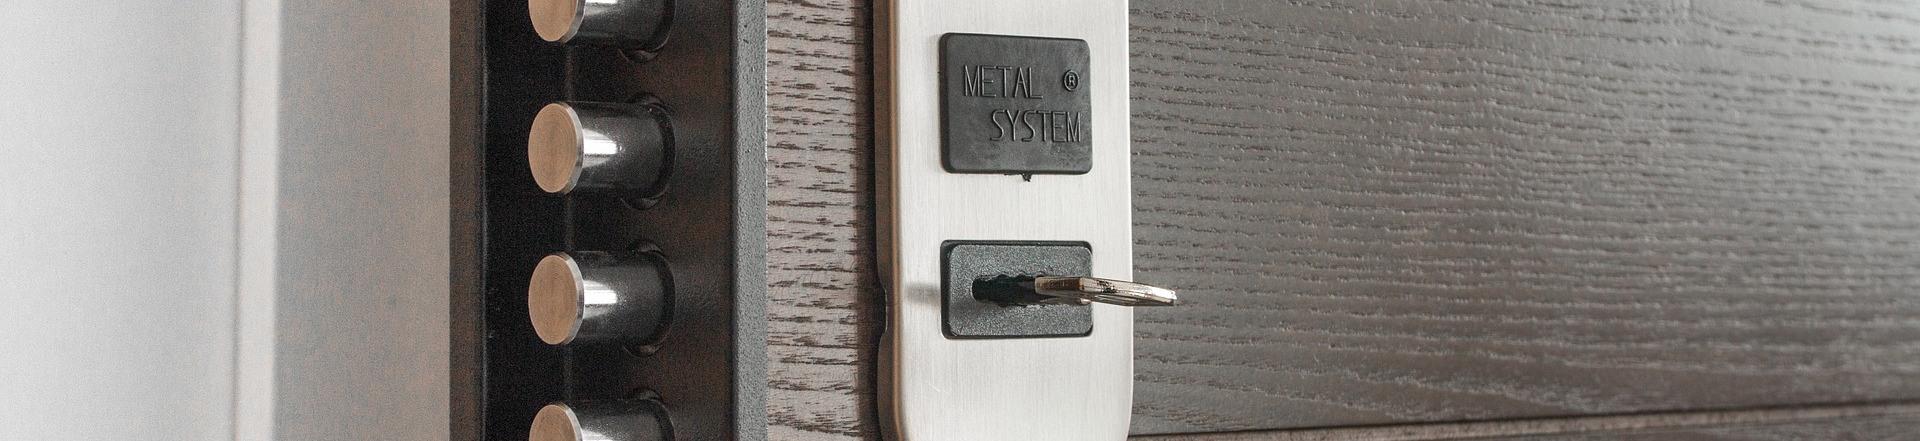 puerta de seguridad hori - Instalacion Puertas Blindadas hospitalet de llobregat Puertas Acorazadas hospitalet de llobregat